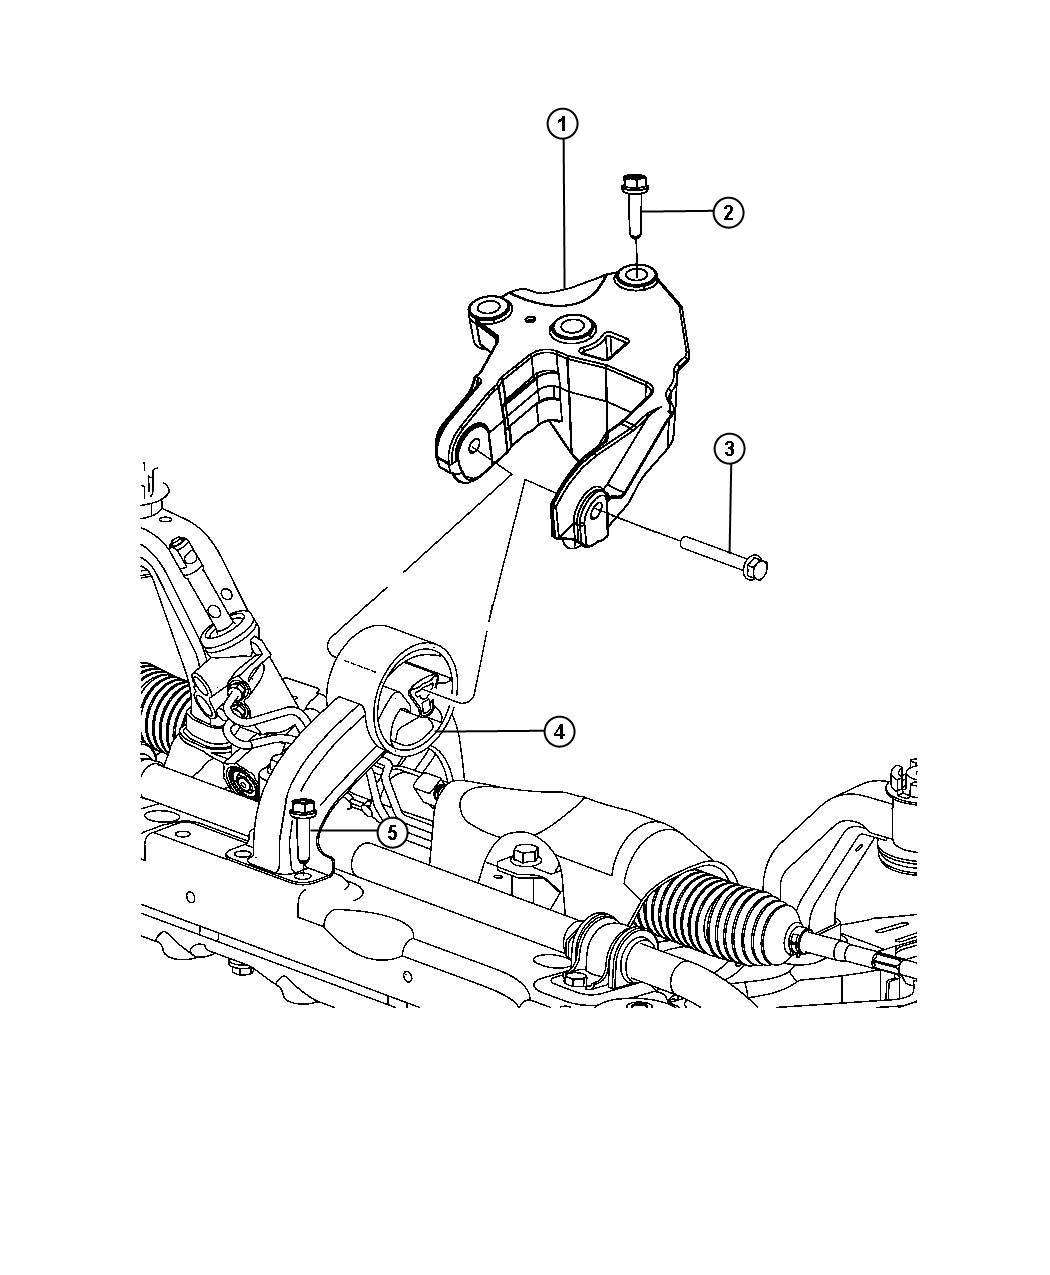 Chrysler 200 Bushing, engine mount. Isolator. Rear. [front